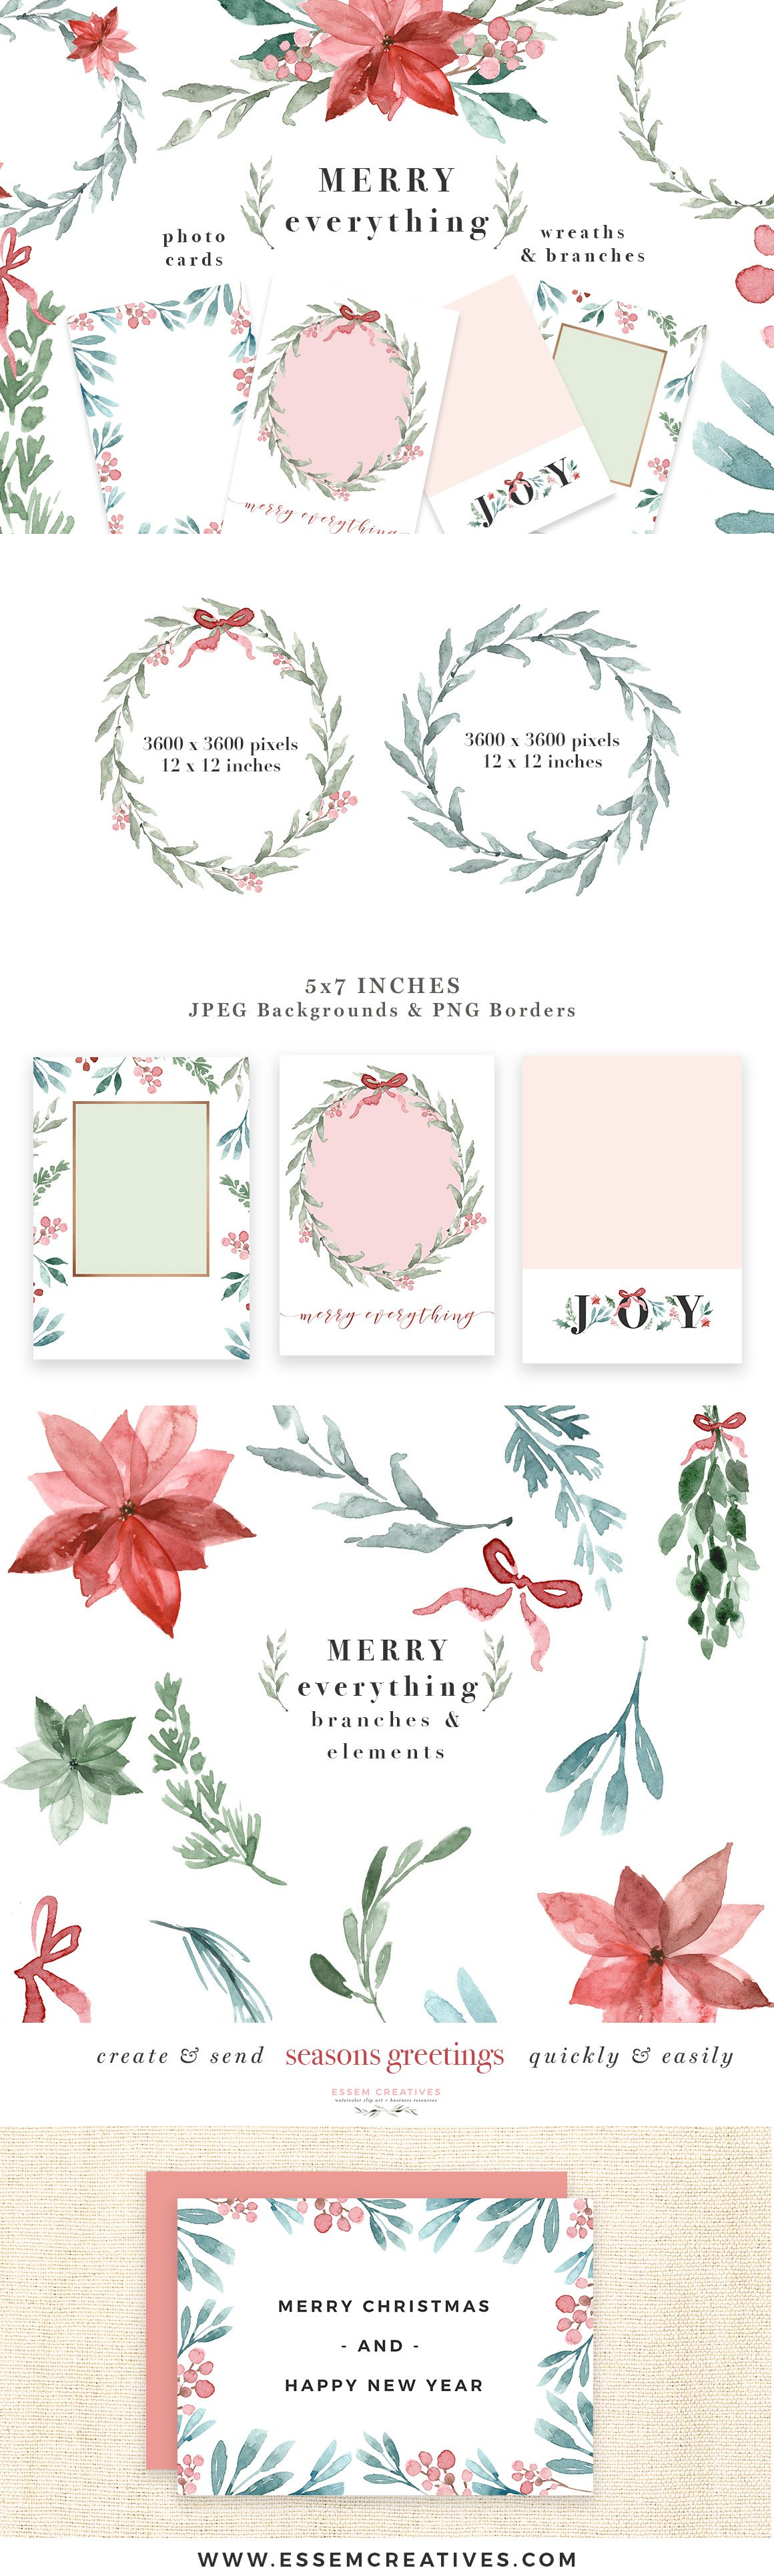 merry christmas wreath card clipart illustrations creative market